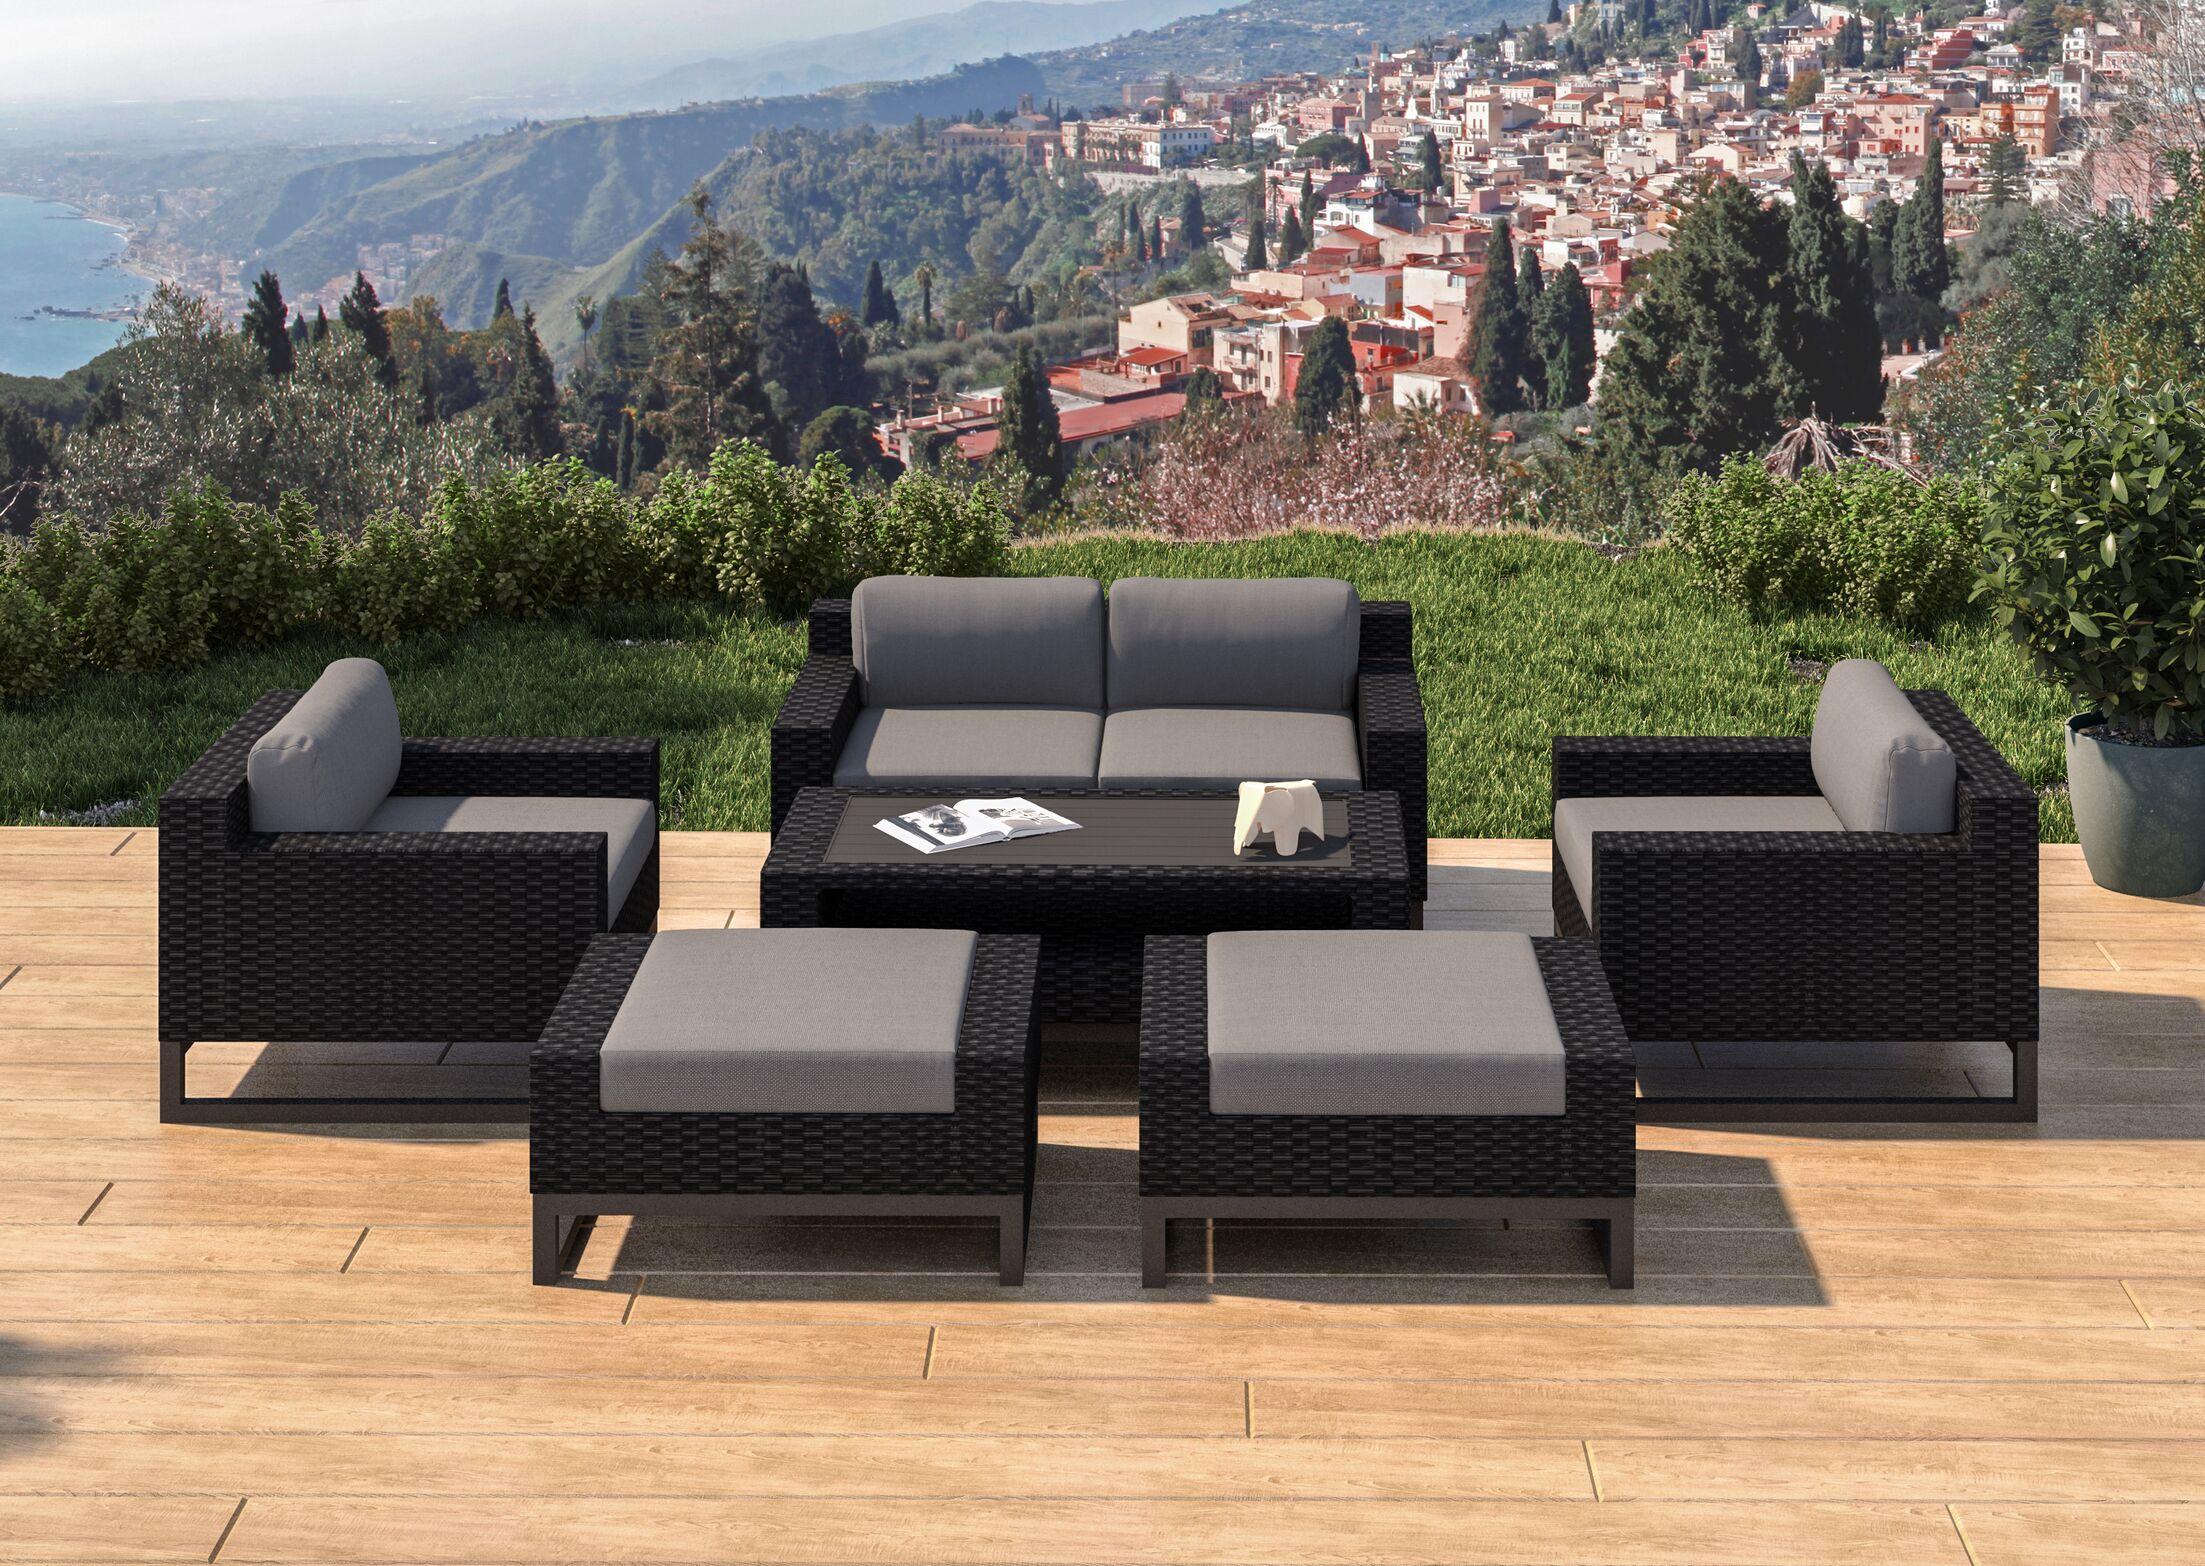 Santino 7 Piece Rattan Sofa Seating Group with Cushions